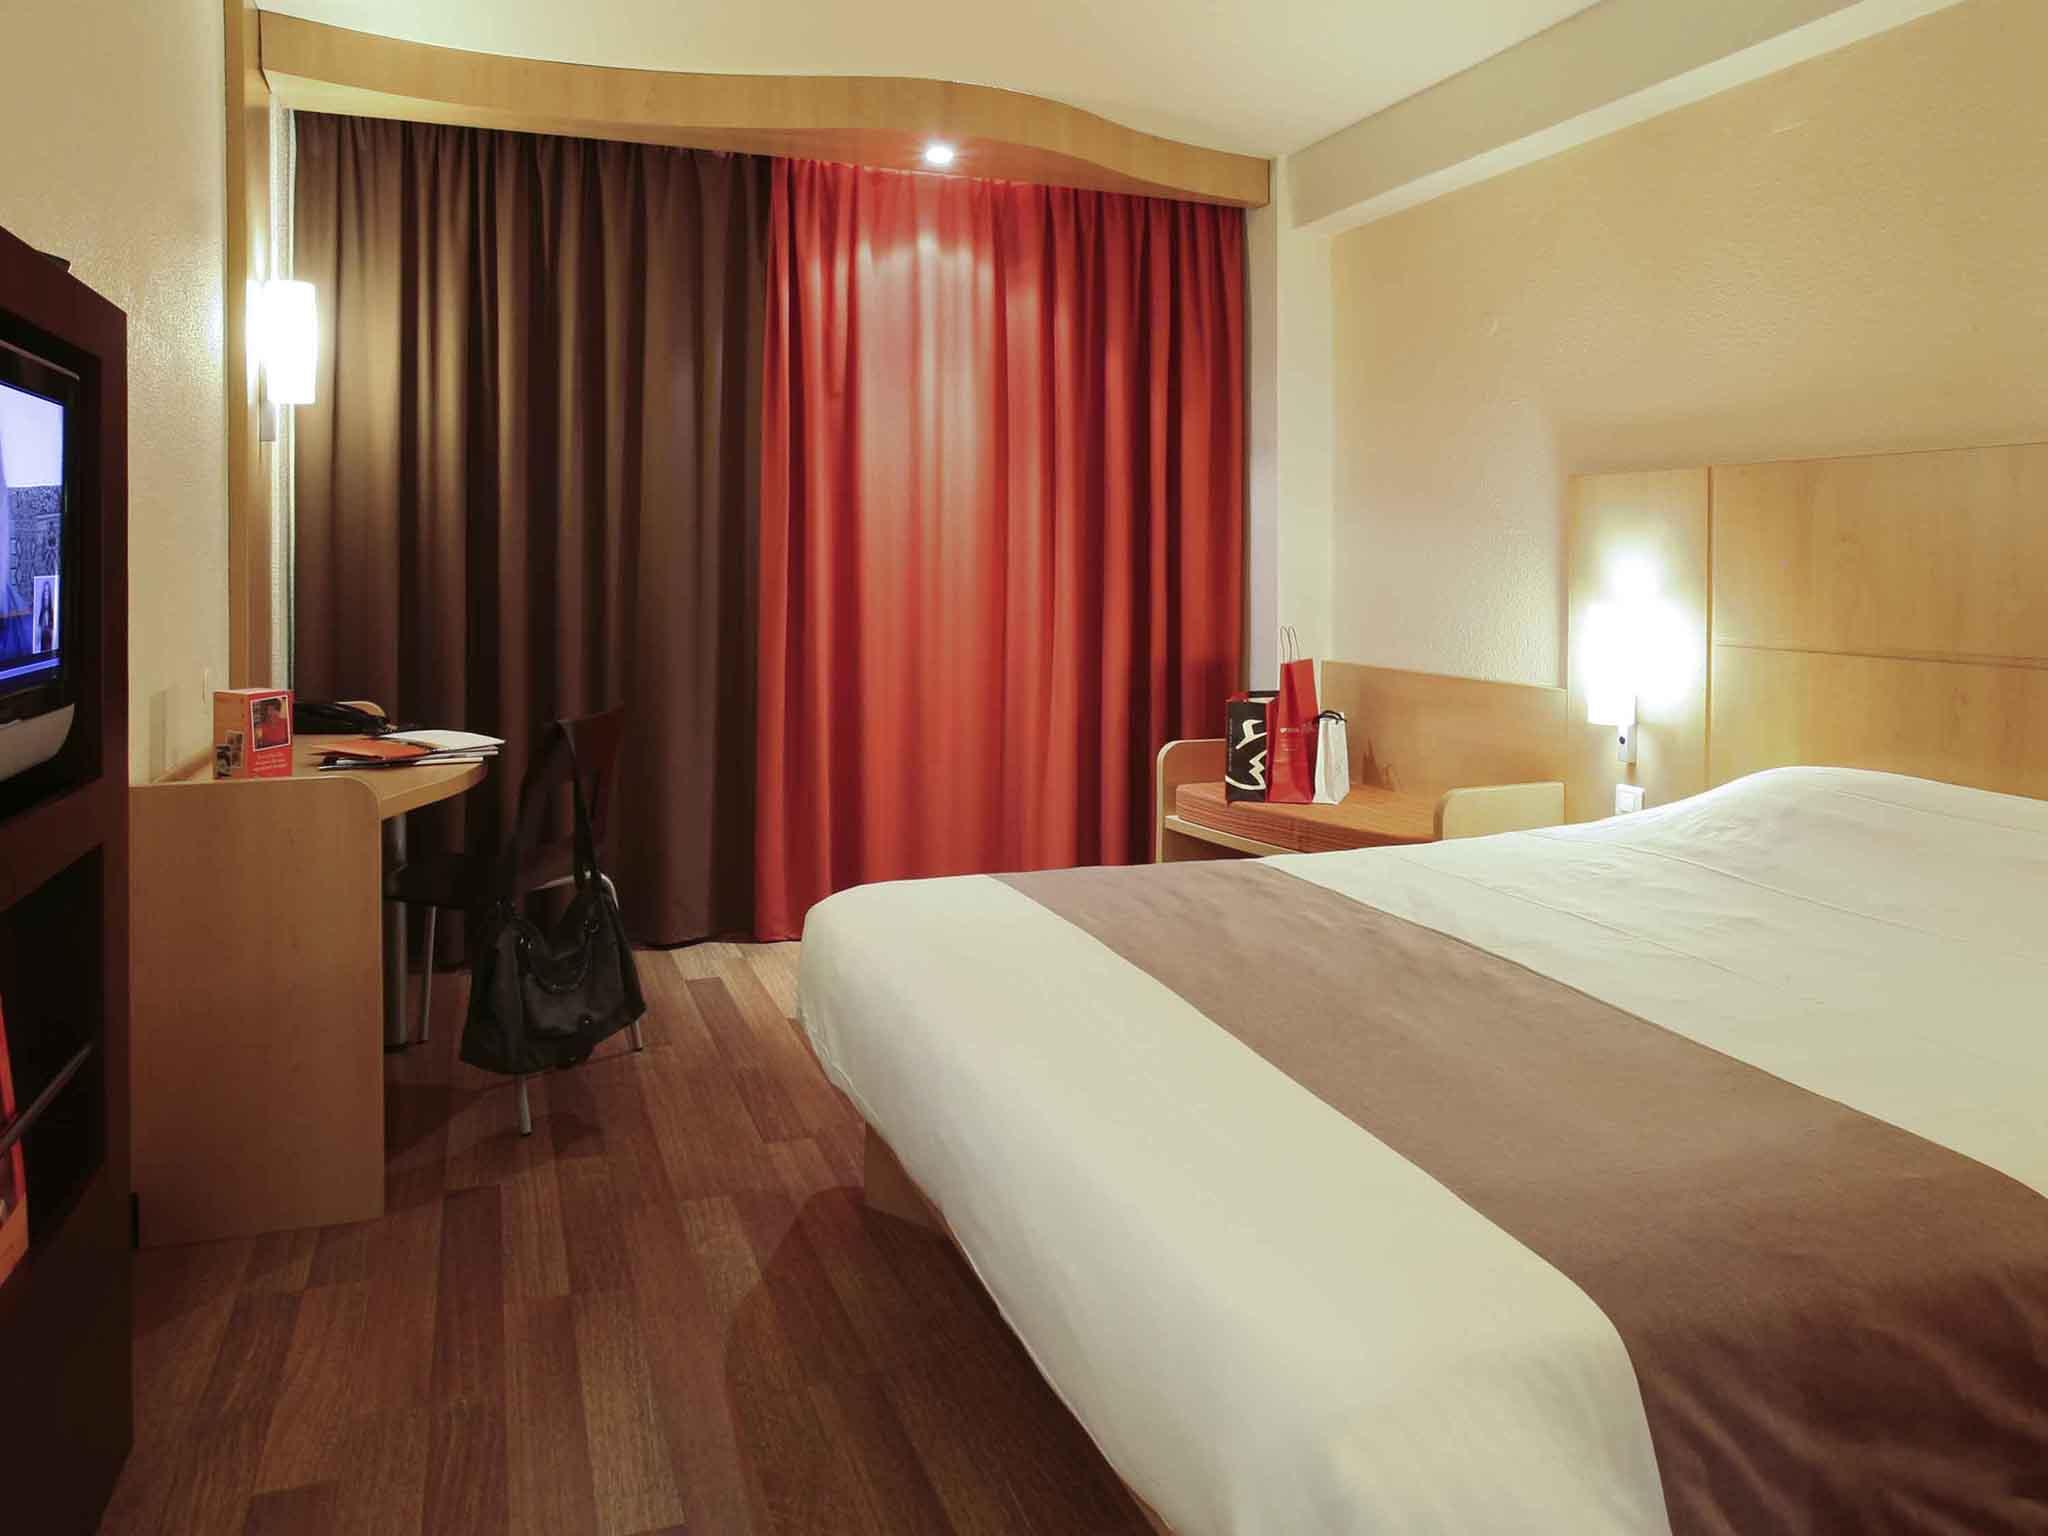 H tel ibis braga h tel conomique en plein centre historique for Hotel economique